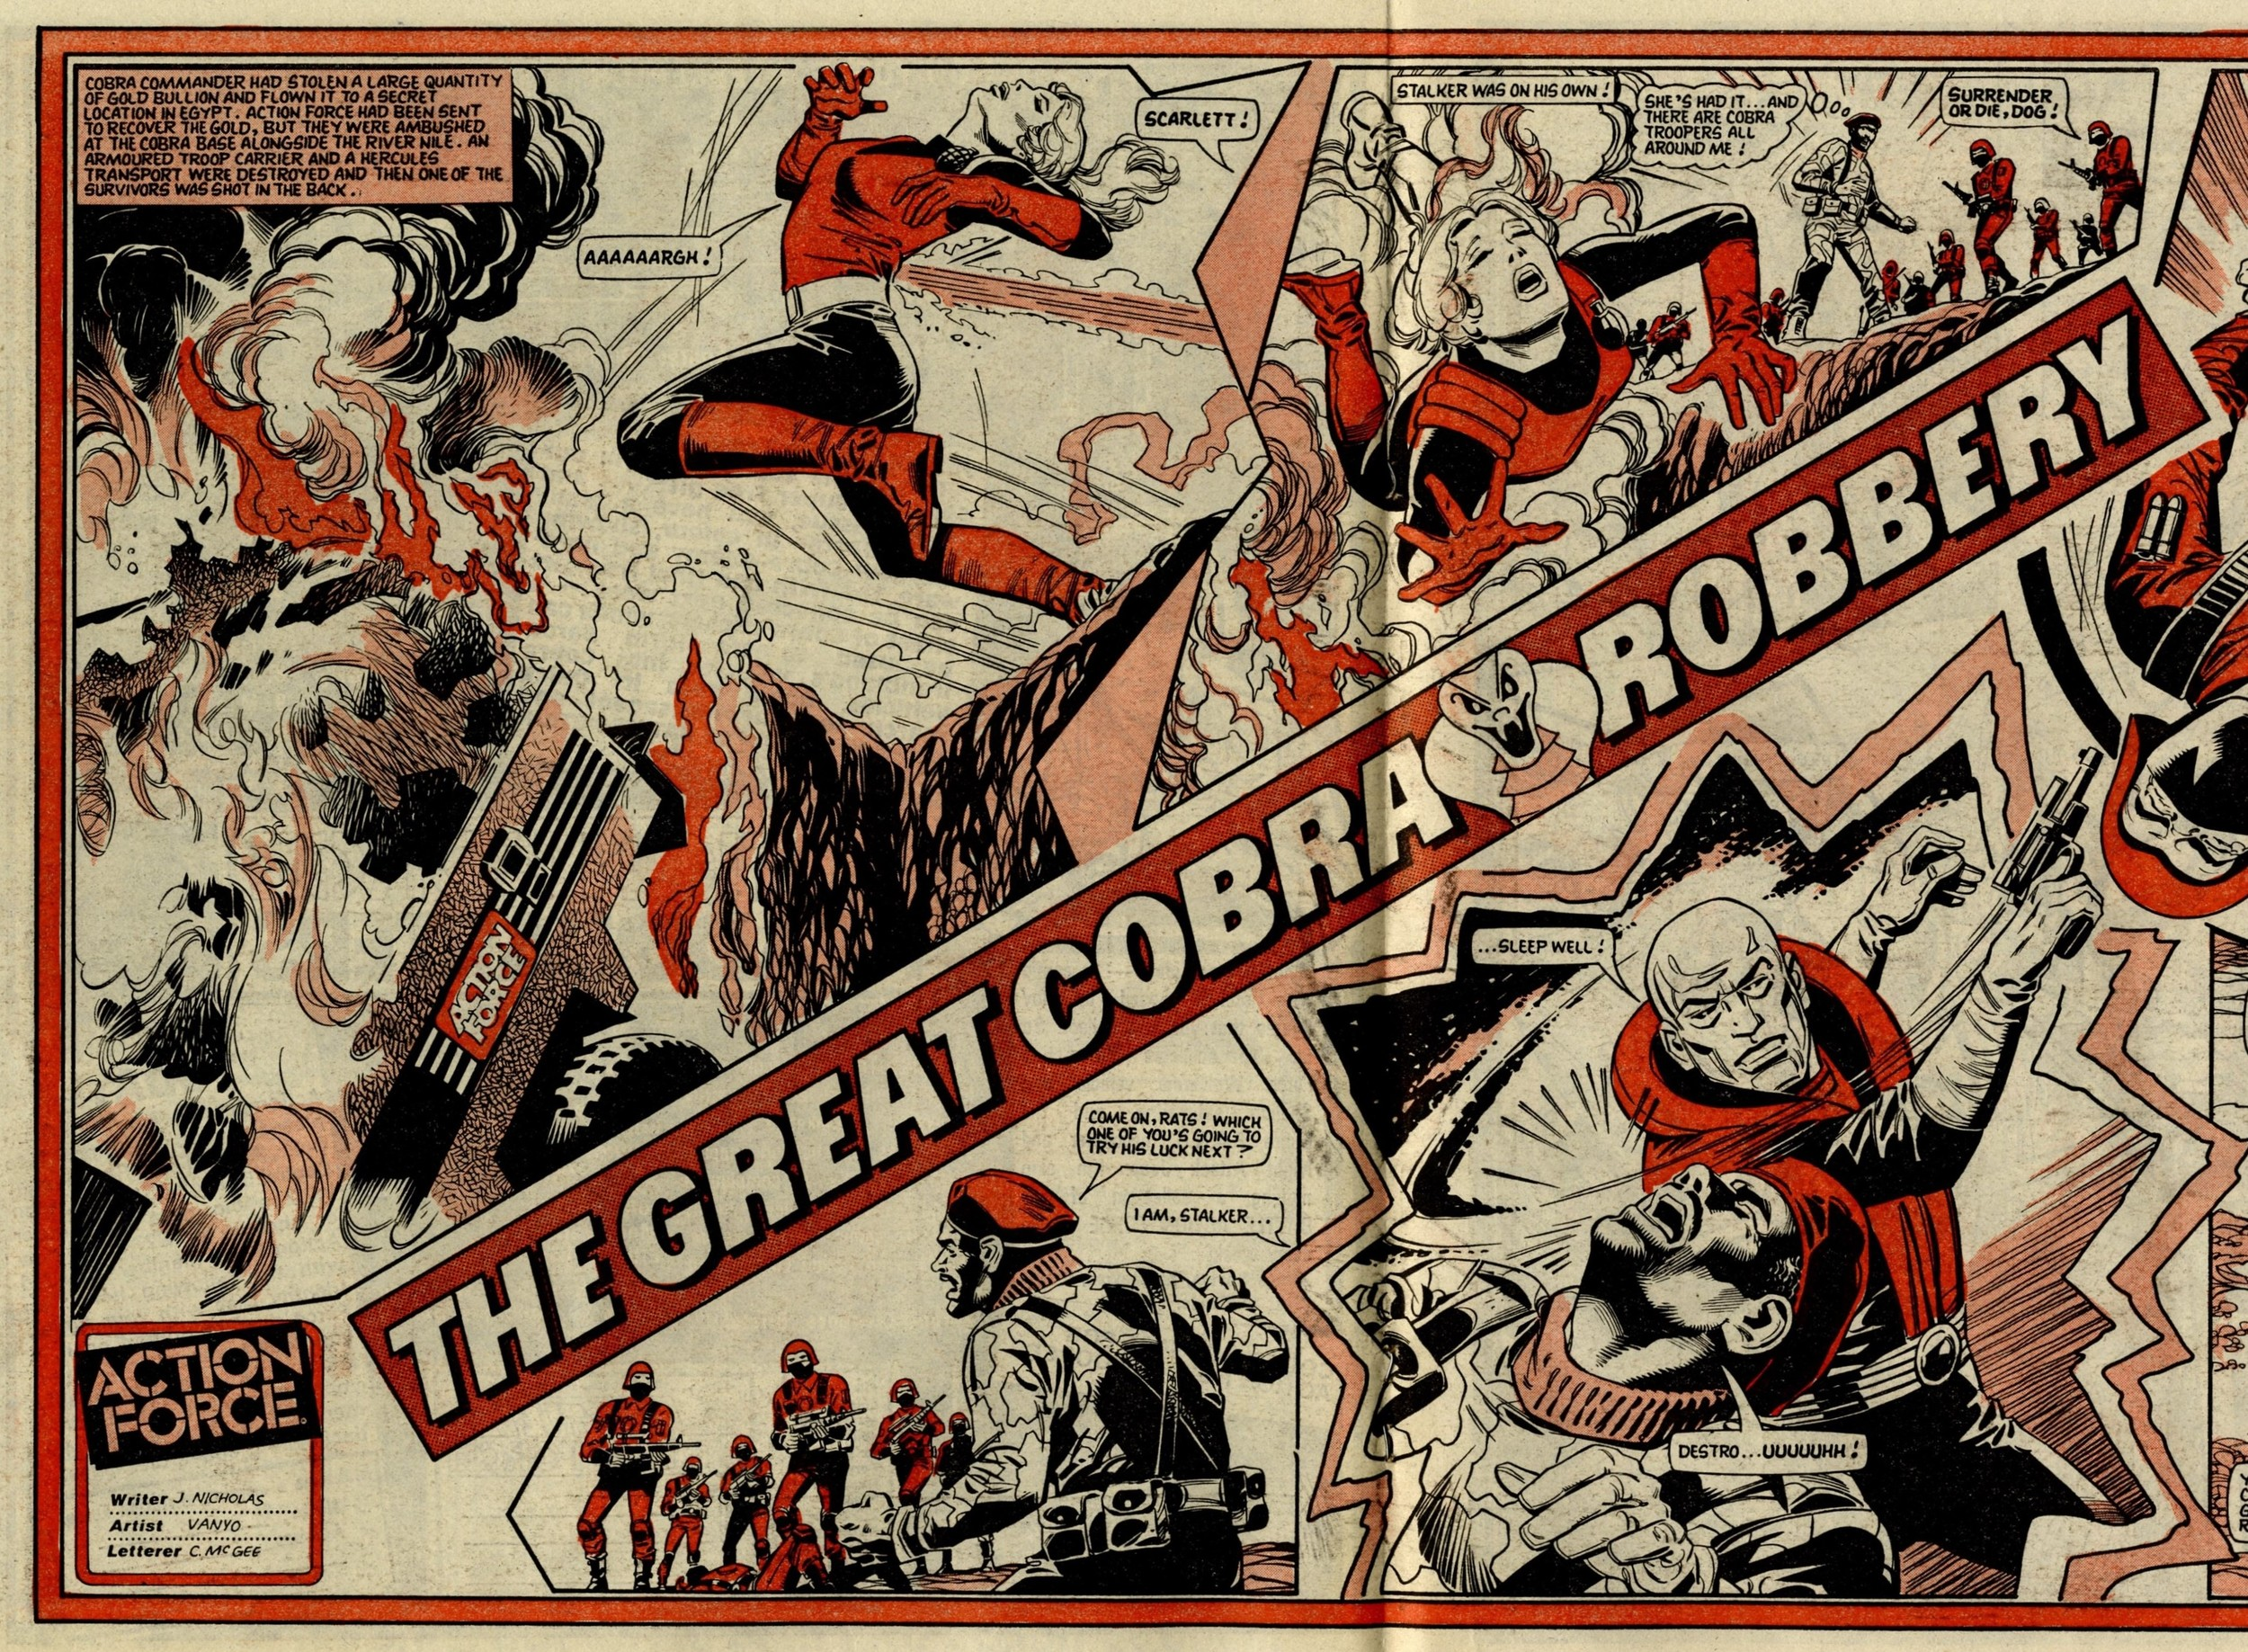 Action force: The Great Cobra Robbery: James Nicholas (writer), Eduardo Vanyo (artist)